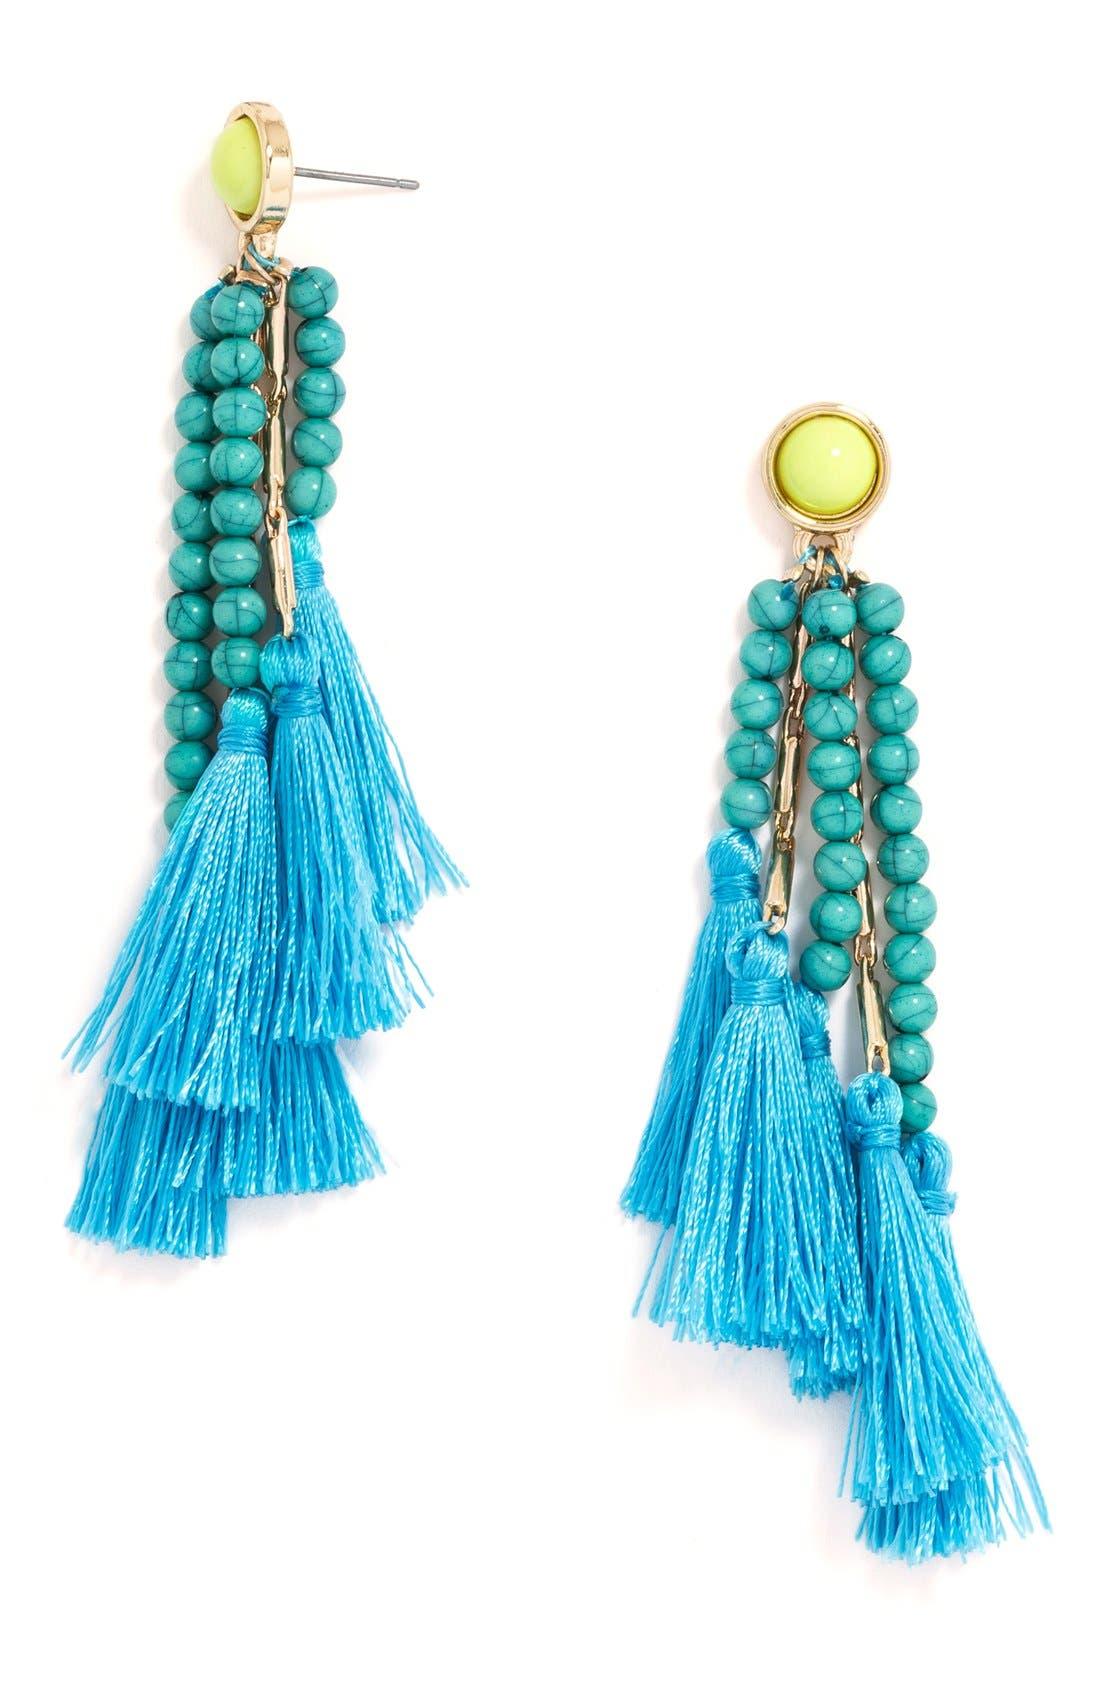 BAUBLEBAR 'Adriatic' Beaded Drop Earrings, Main, color, 710